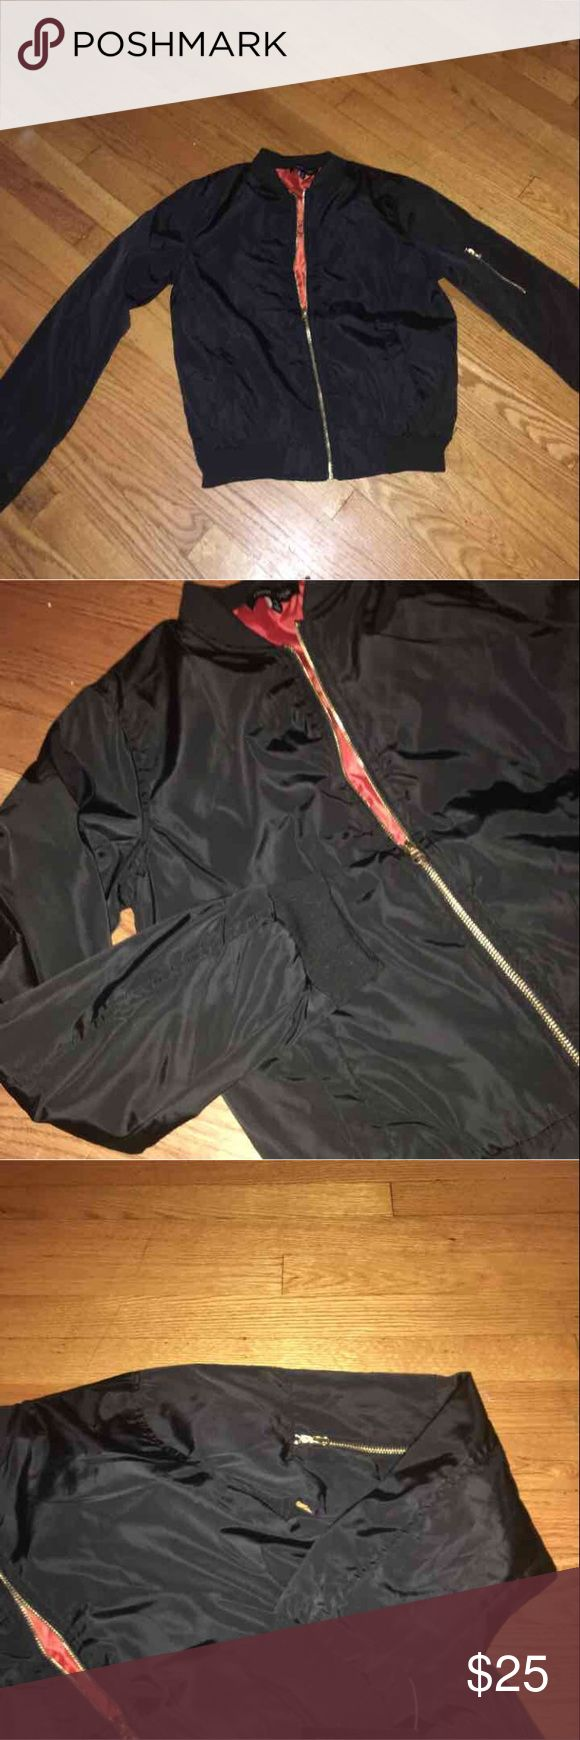 Black Bomber Jacket Black with gold hardware BRAND NEW Jackets & Coats Puffers